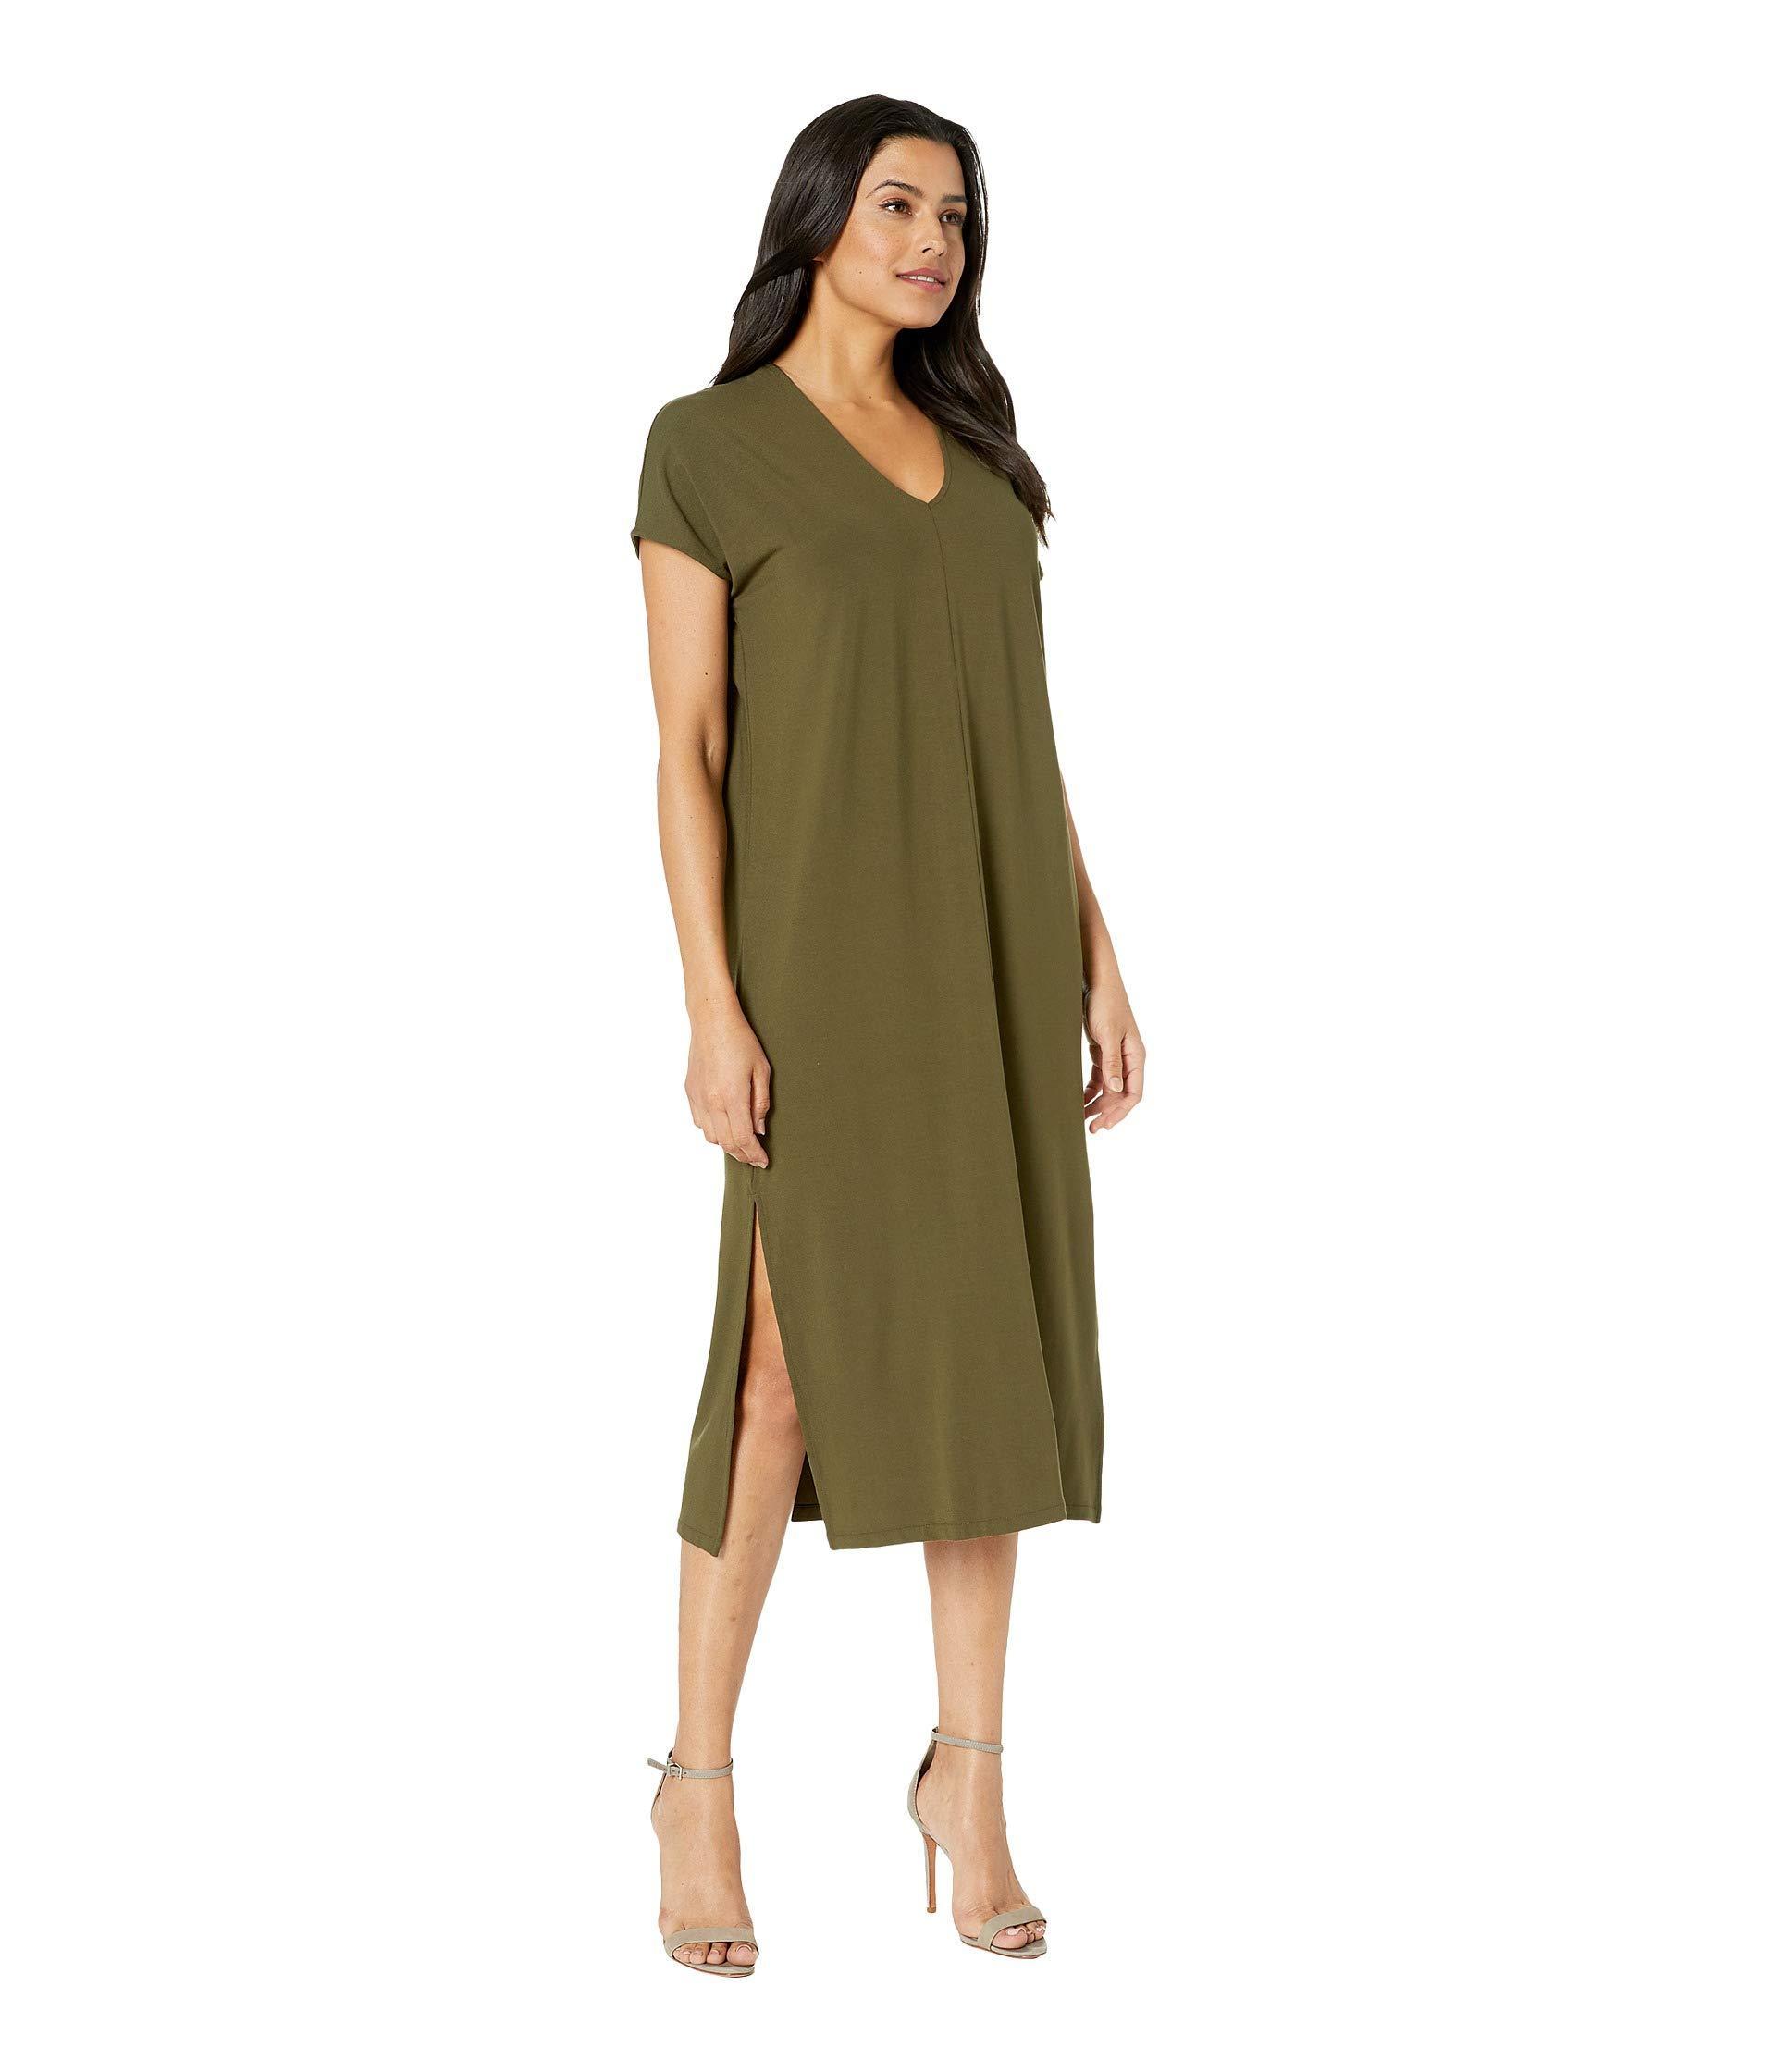 03ddf8d2b5b7a Lyst - Lilla P Double V-neck Dress (black) Women's Dress in Green